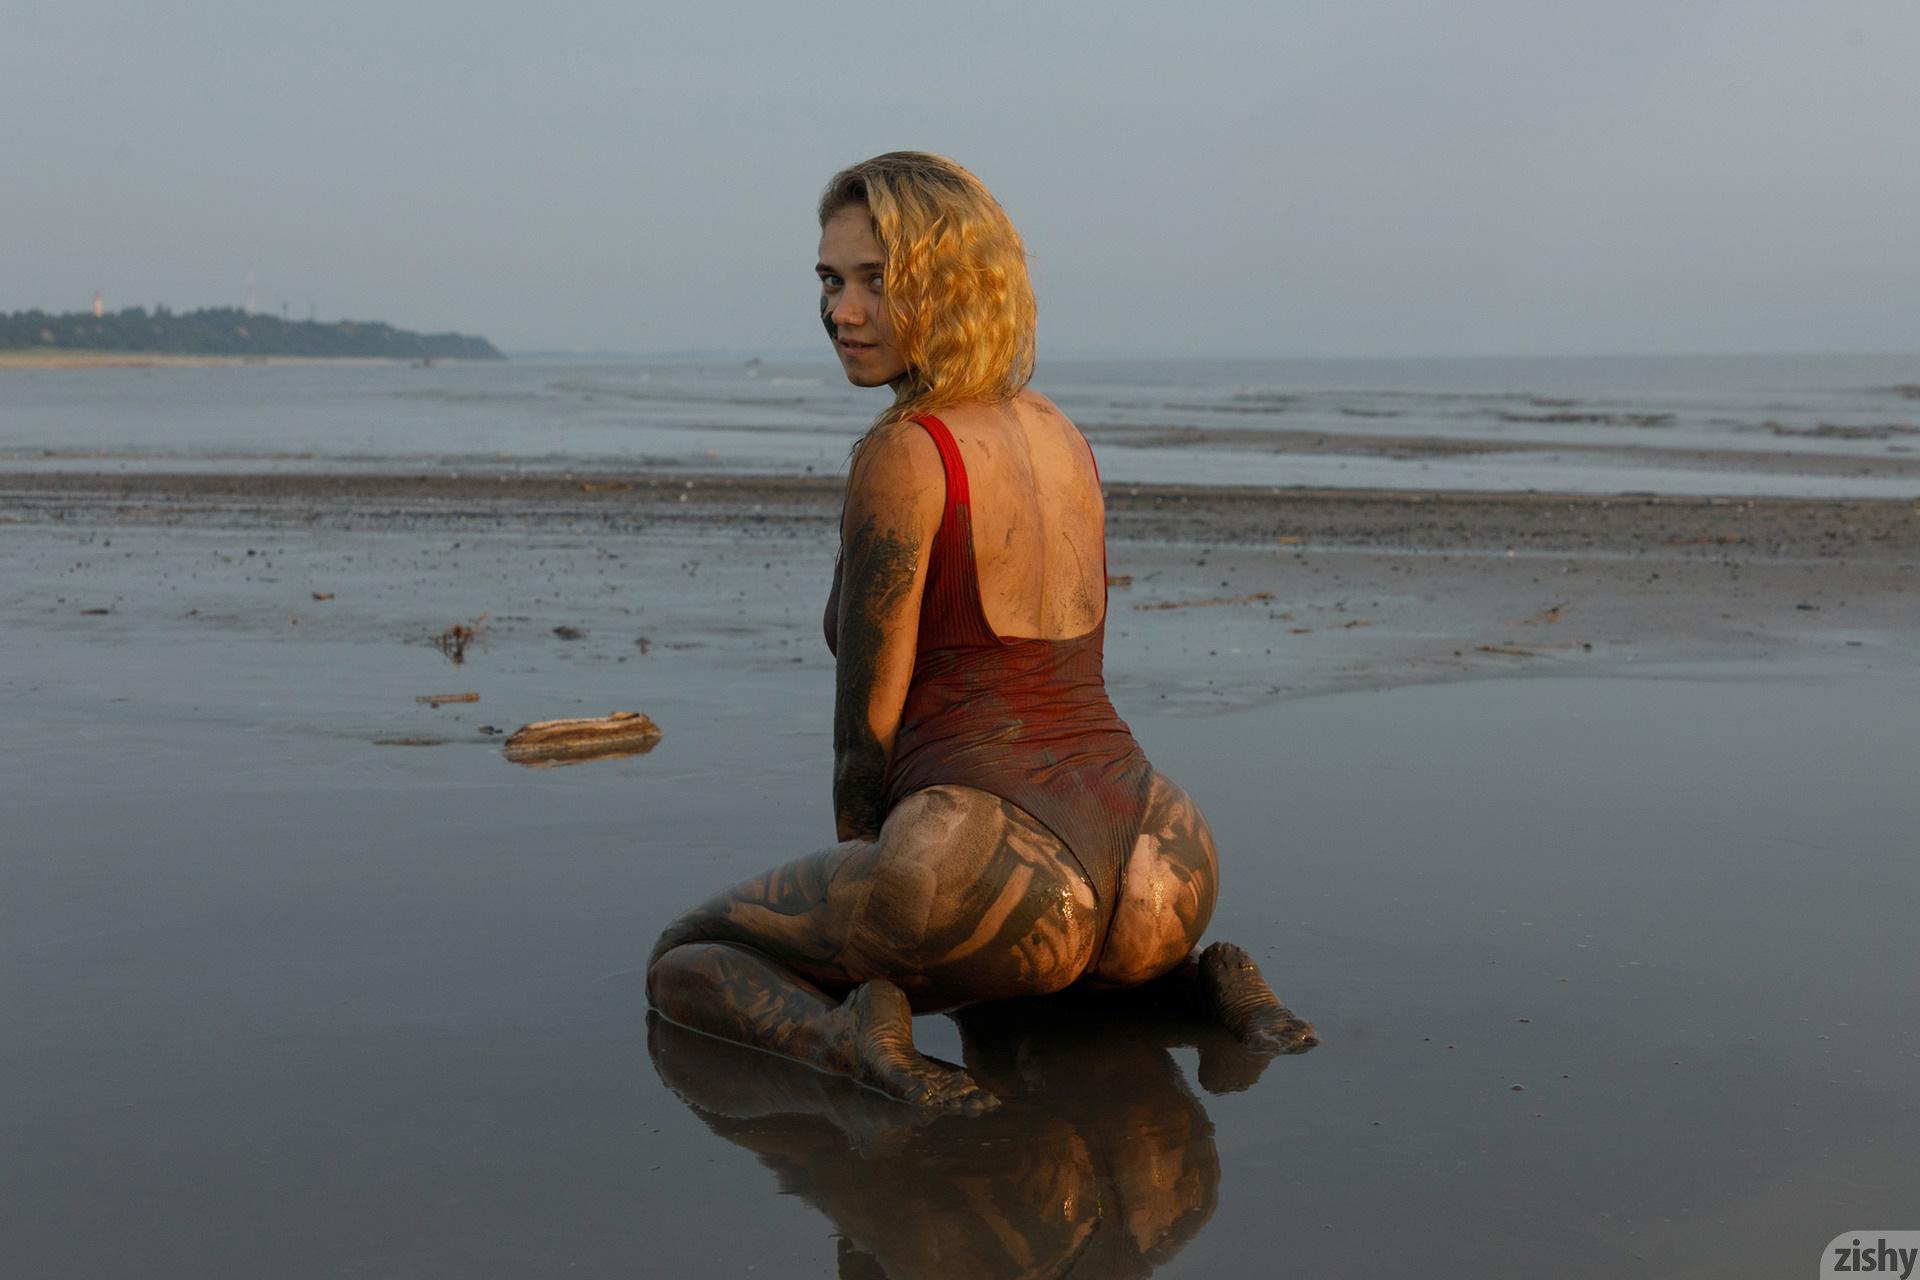 Sofia Orlova On Gryaznyy Beach Zishy (40)